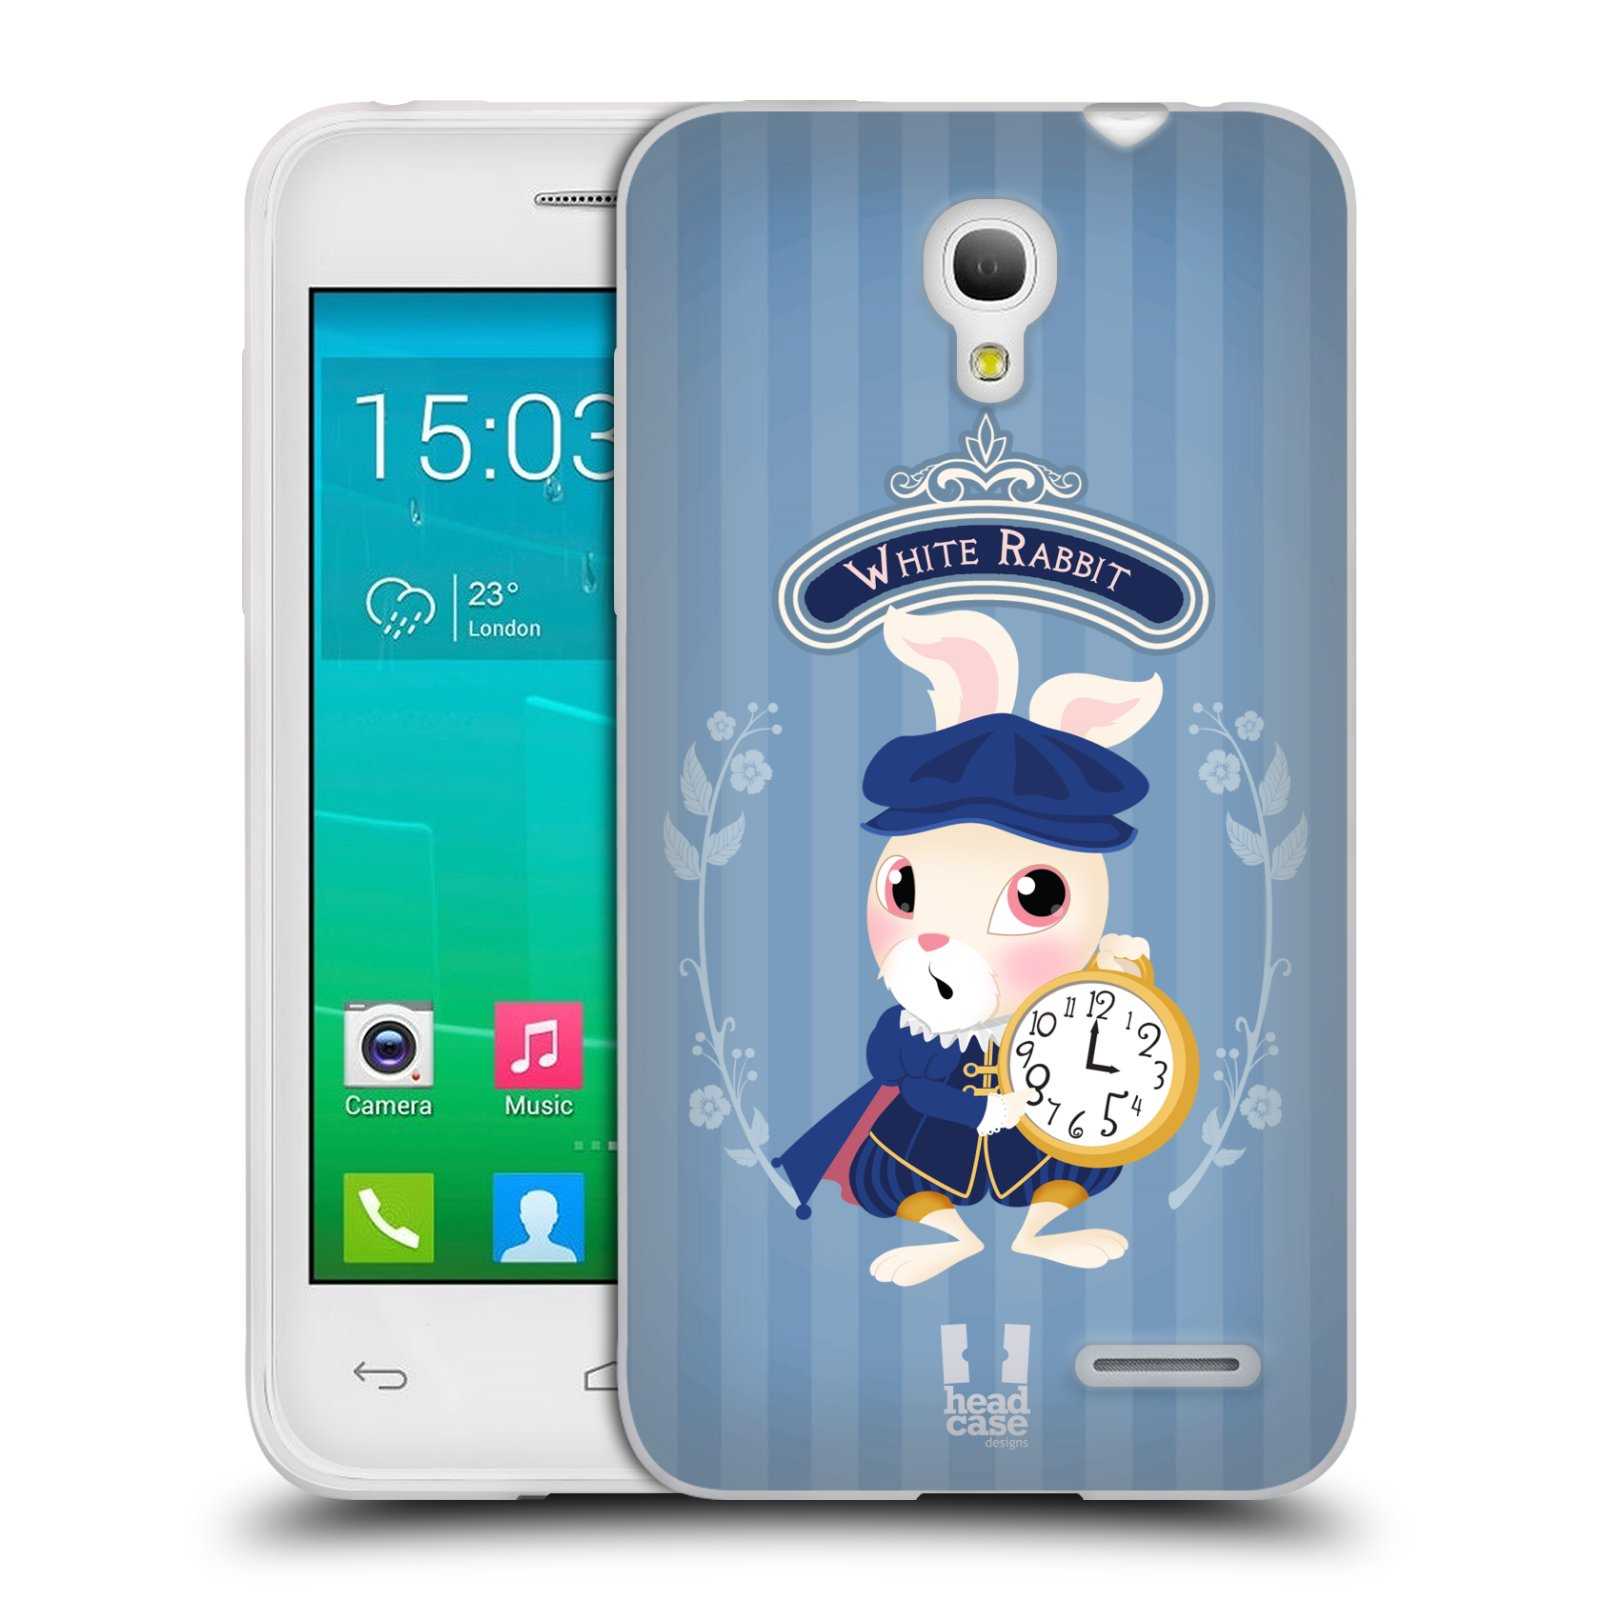 HEAD CASE silikonový obal na mobil Alcatel POP S3 OT-5050Y vzor Alenka v říši divů králíček